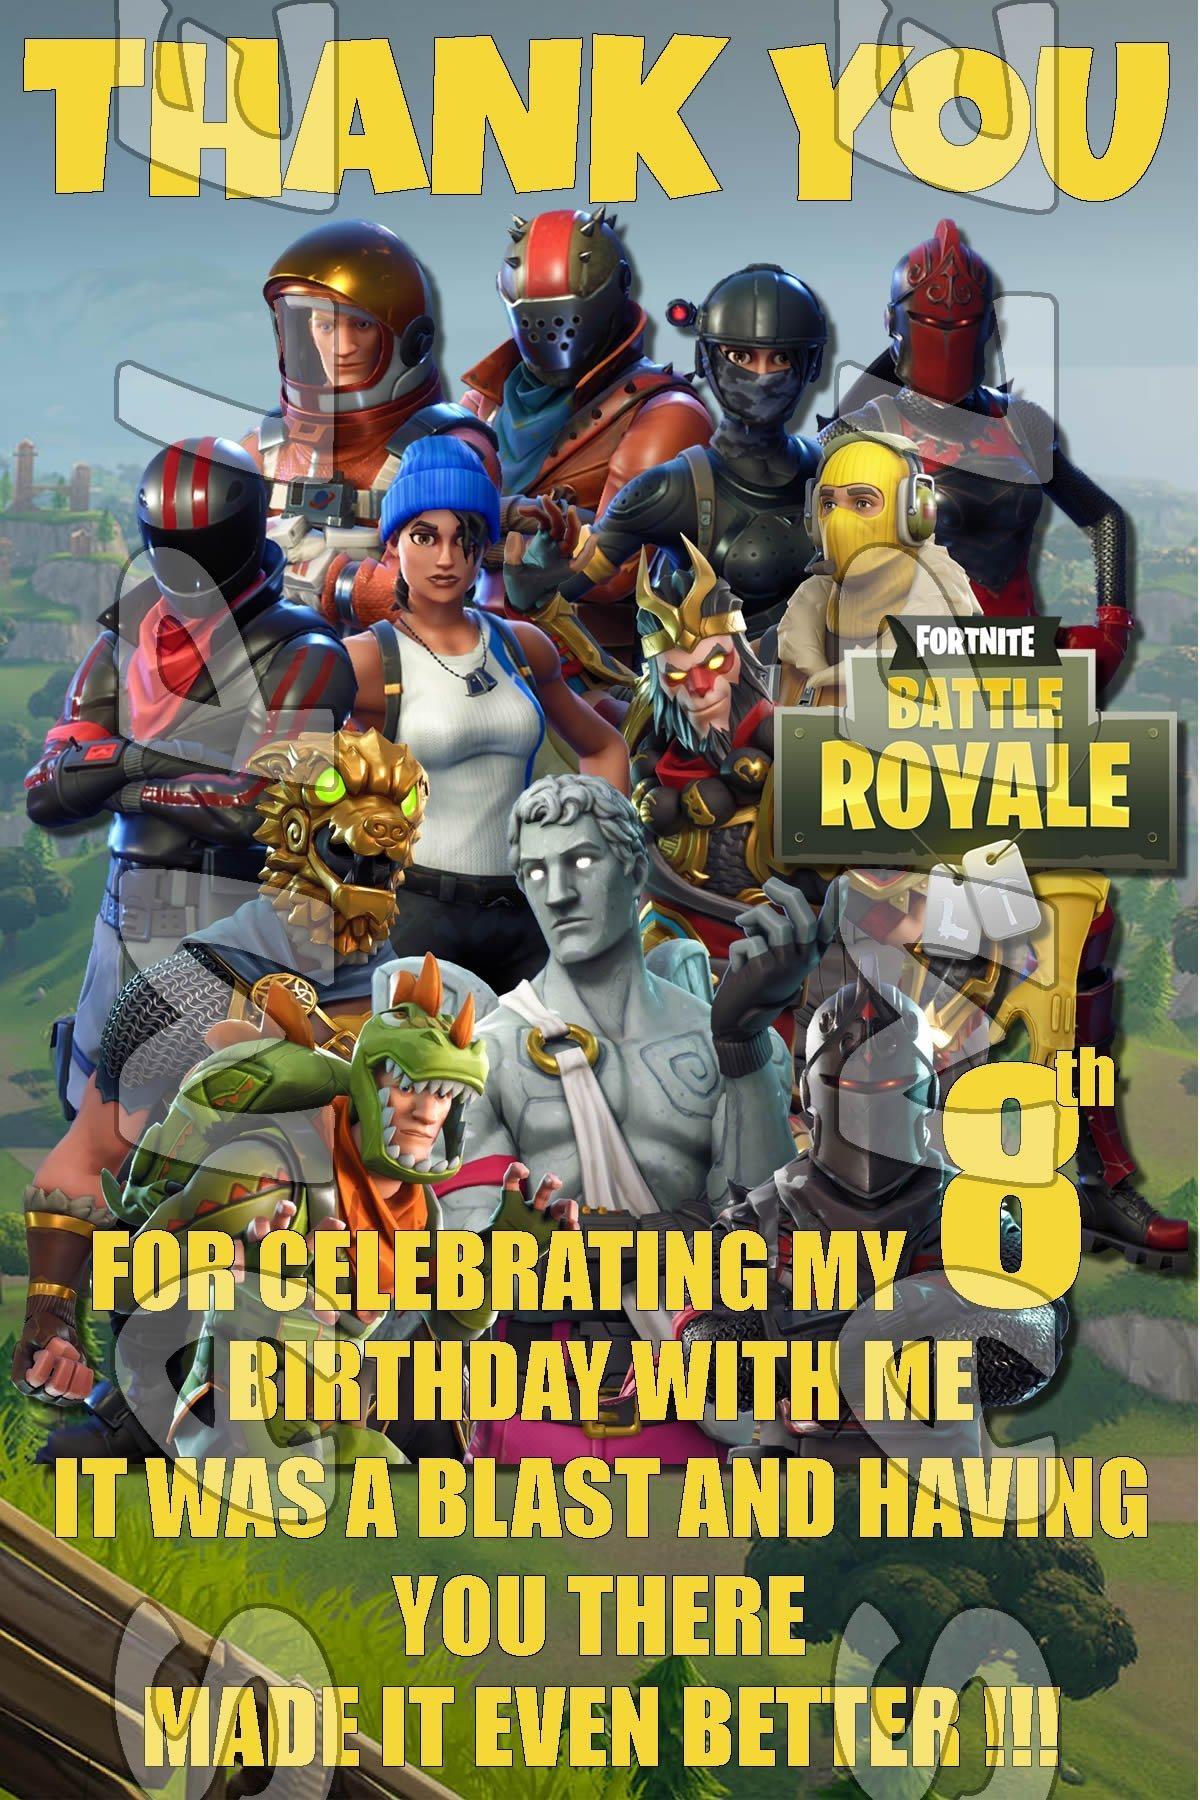 Fortnite 4x6 Birthday Thank You Cards w/Envelopes #1